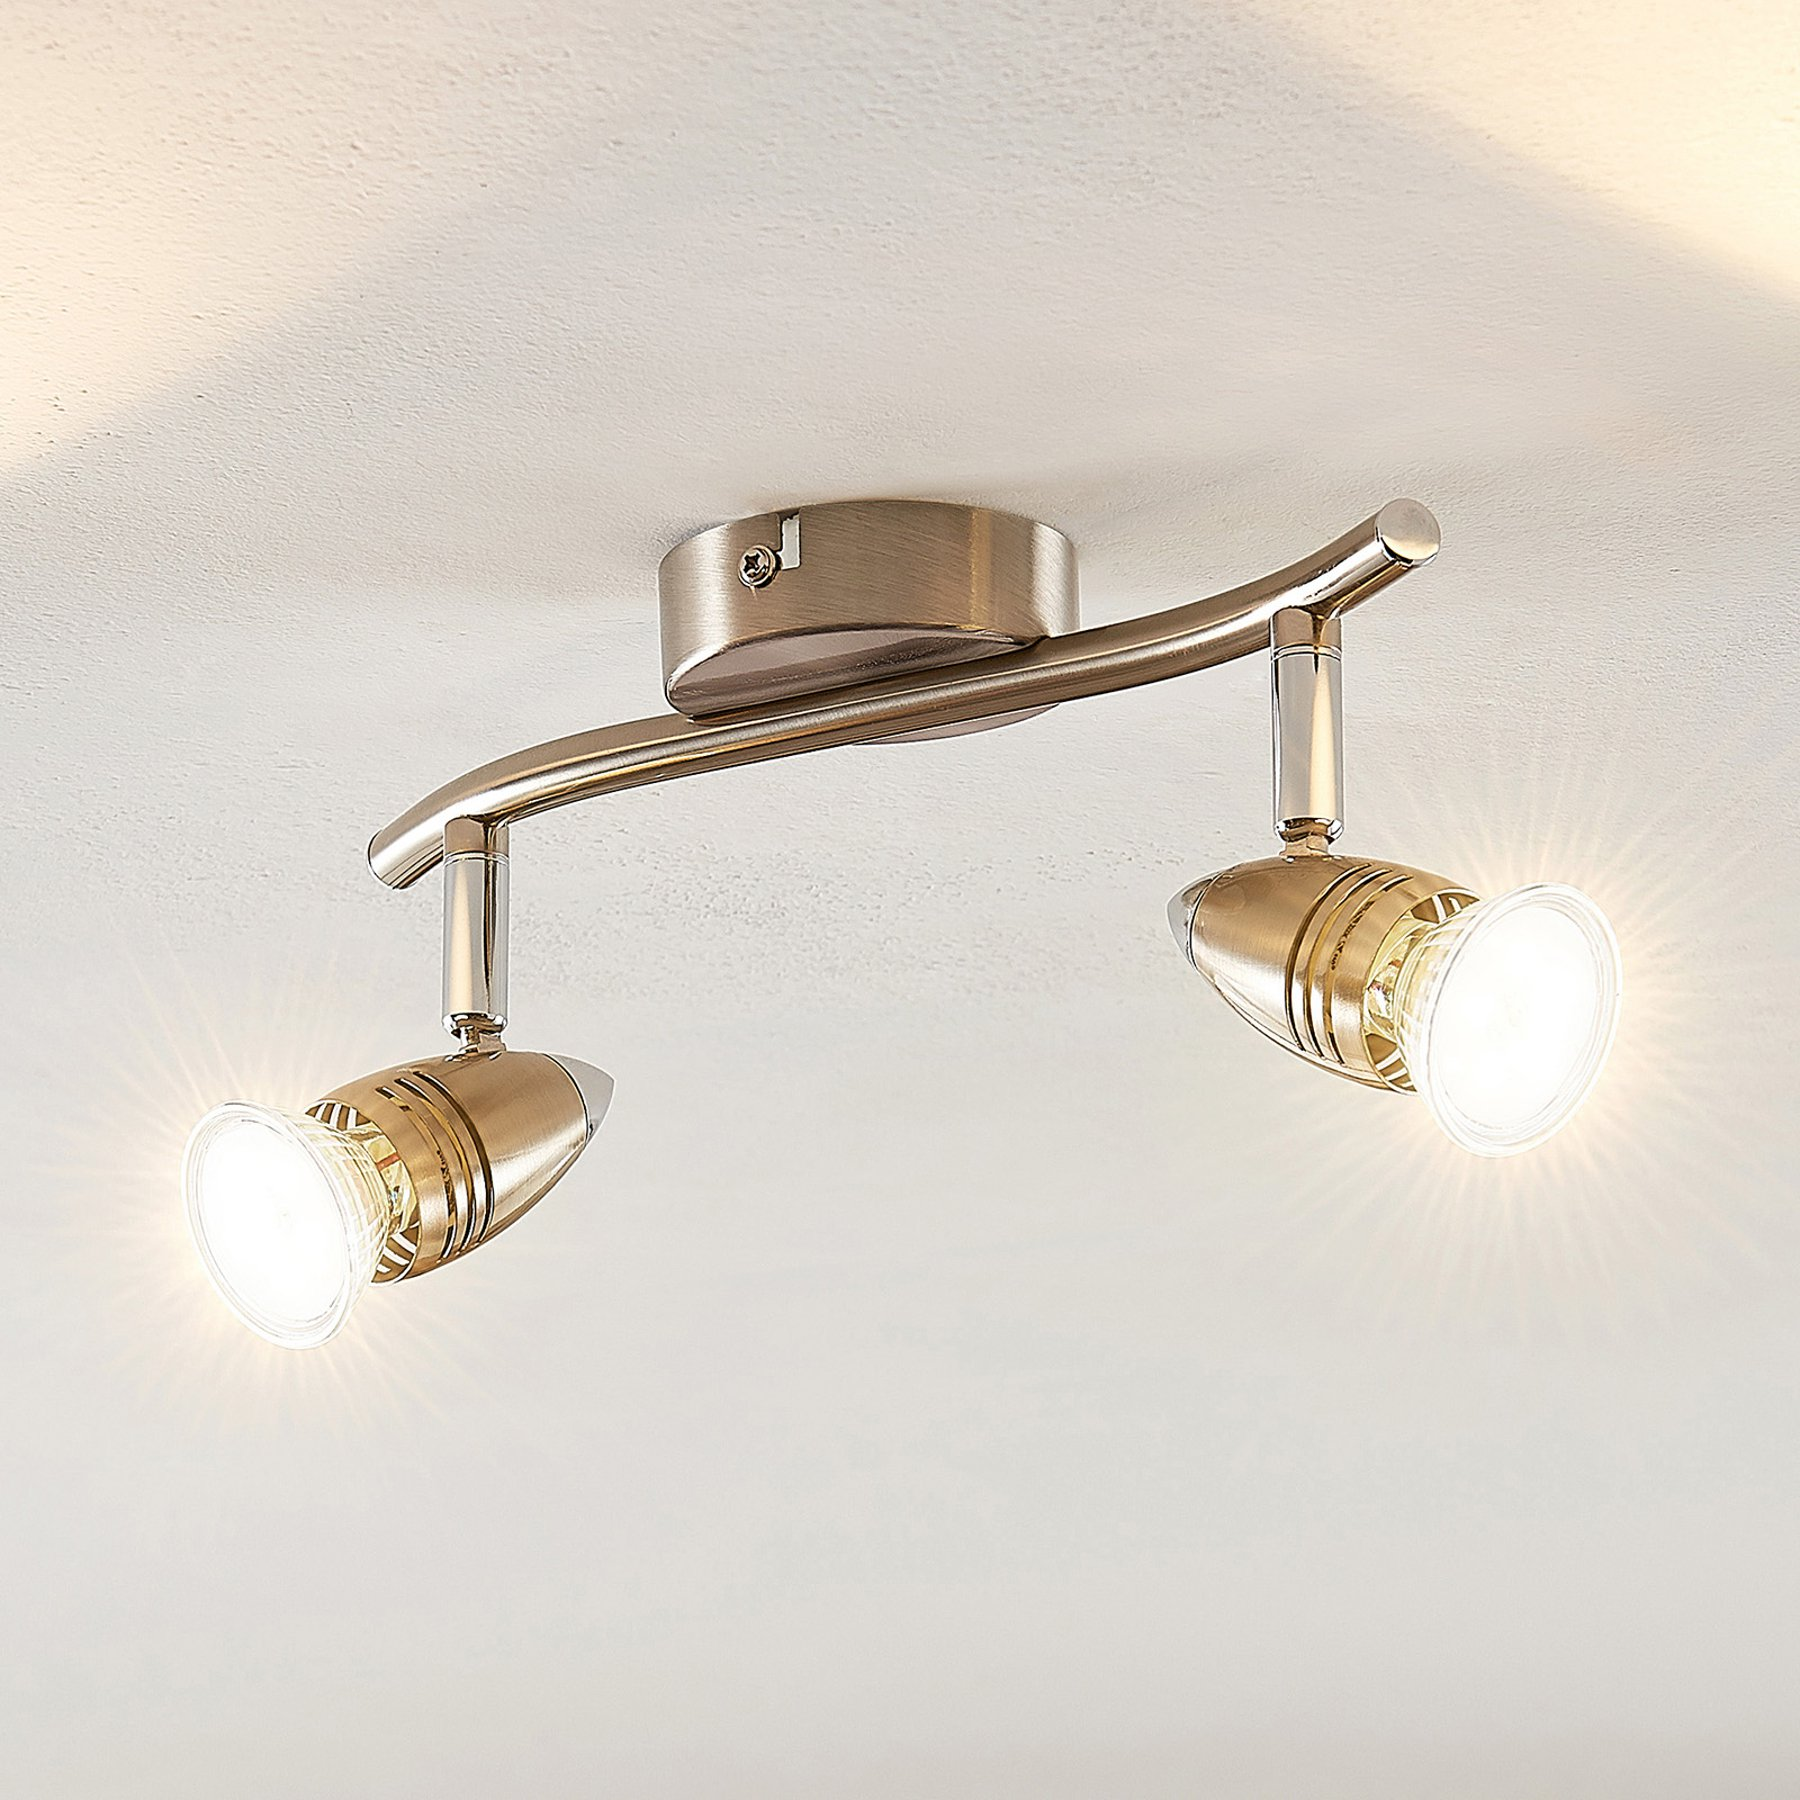 ELC Kalean LED-takspot, nikkel, 2 lyskilder